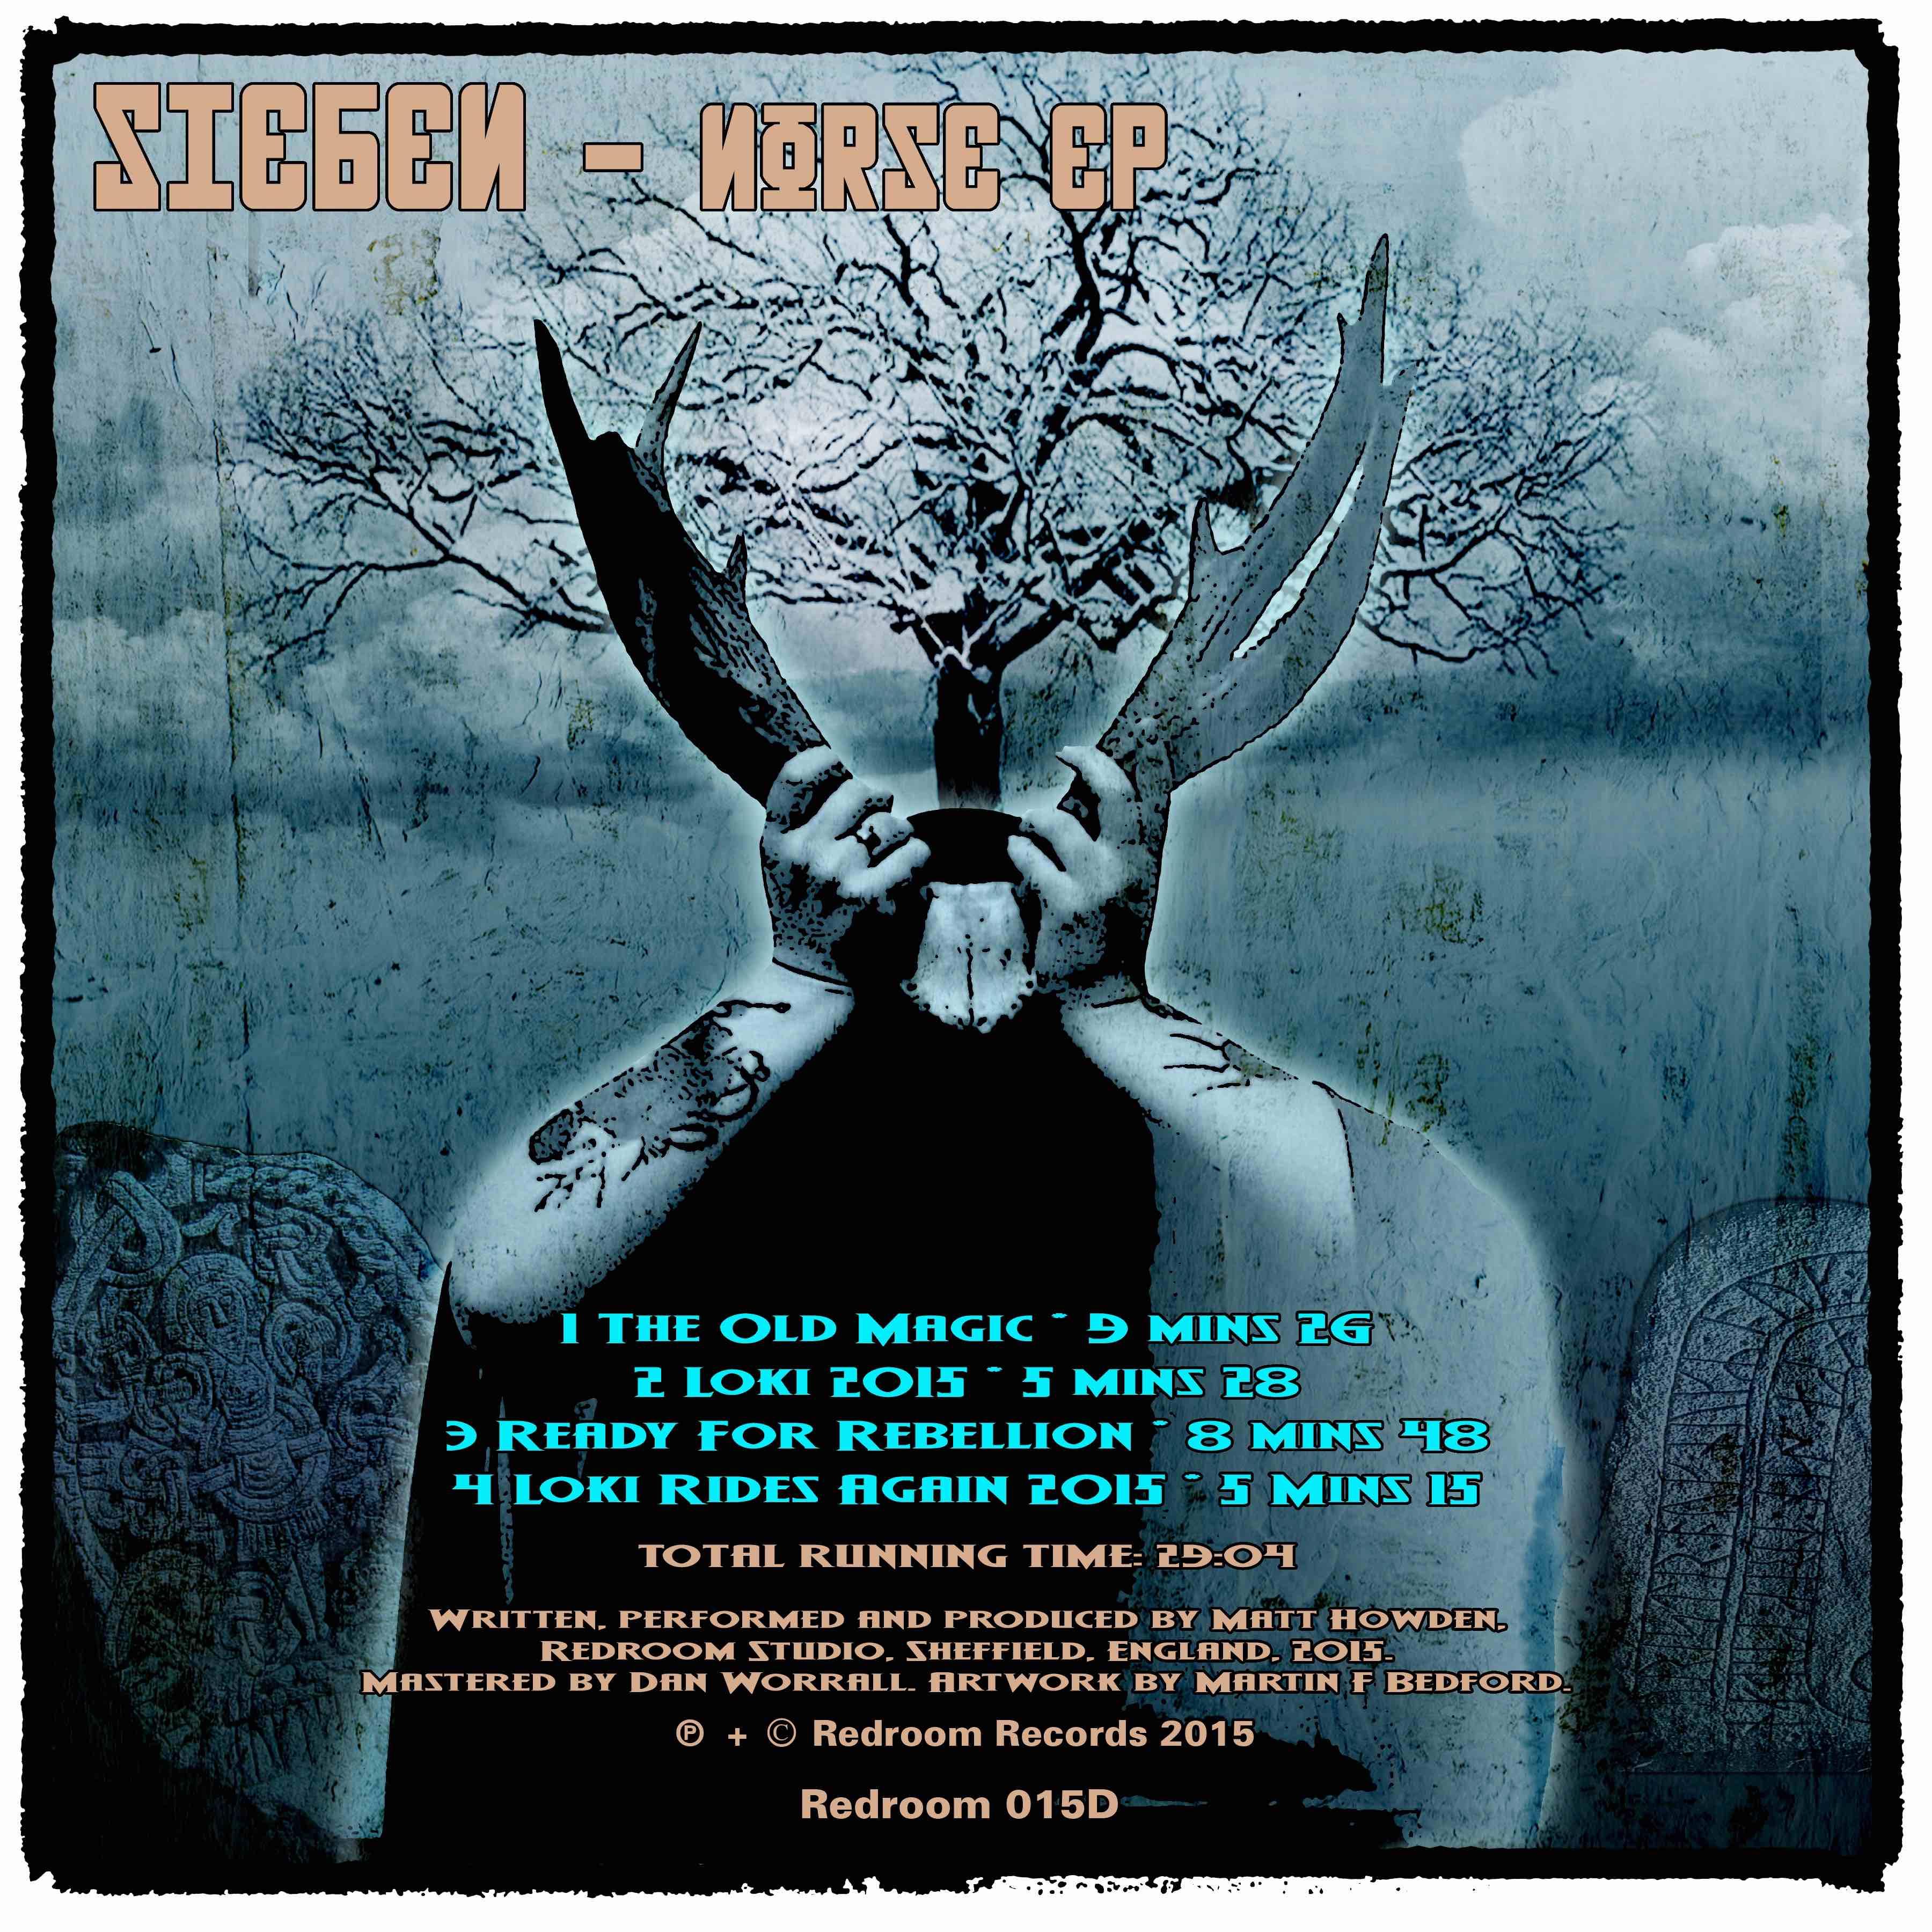 Sieben's Norse EP released 11 Nov 2015